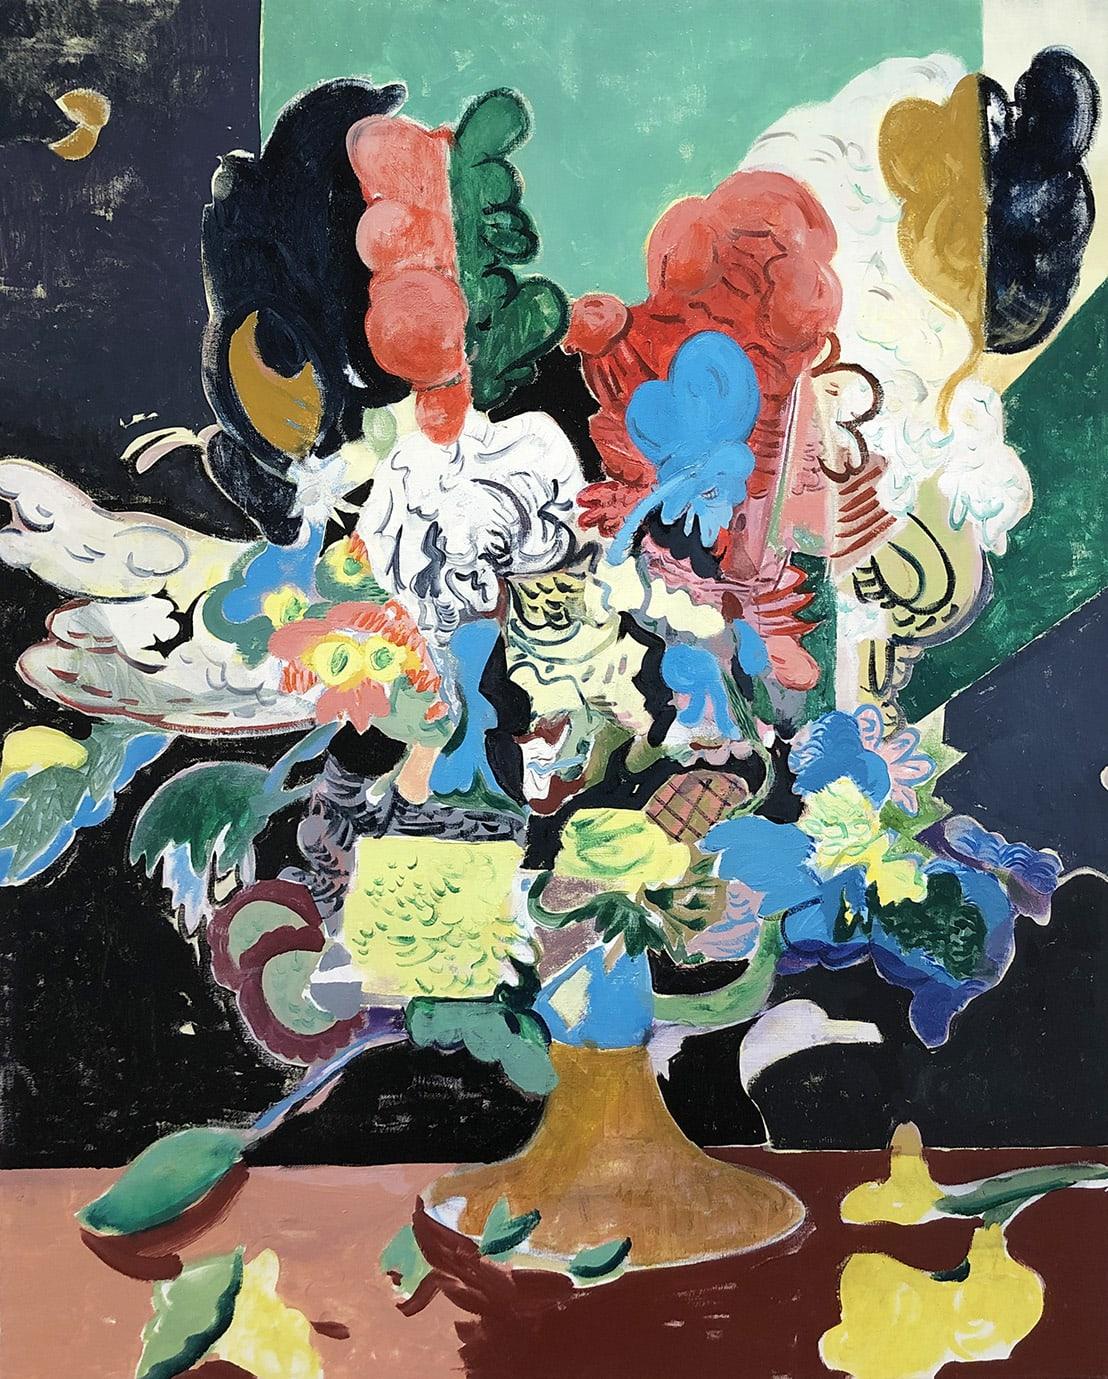 "<span class=""link fancybox-details-link""><a href=""/exhibitions/22/works/artworks498/"">View Detail Page</a></span><div class=""artist""><strong>David Price</strong></div> b.1972<div class=""title""><em>Still Life, June</em>, 2018</div><div class=""medium"">Oil on canvas</div><div class=""dimensions"">100 x 81cm</div>"